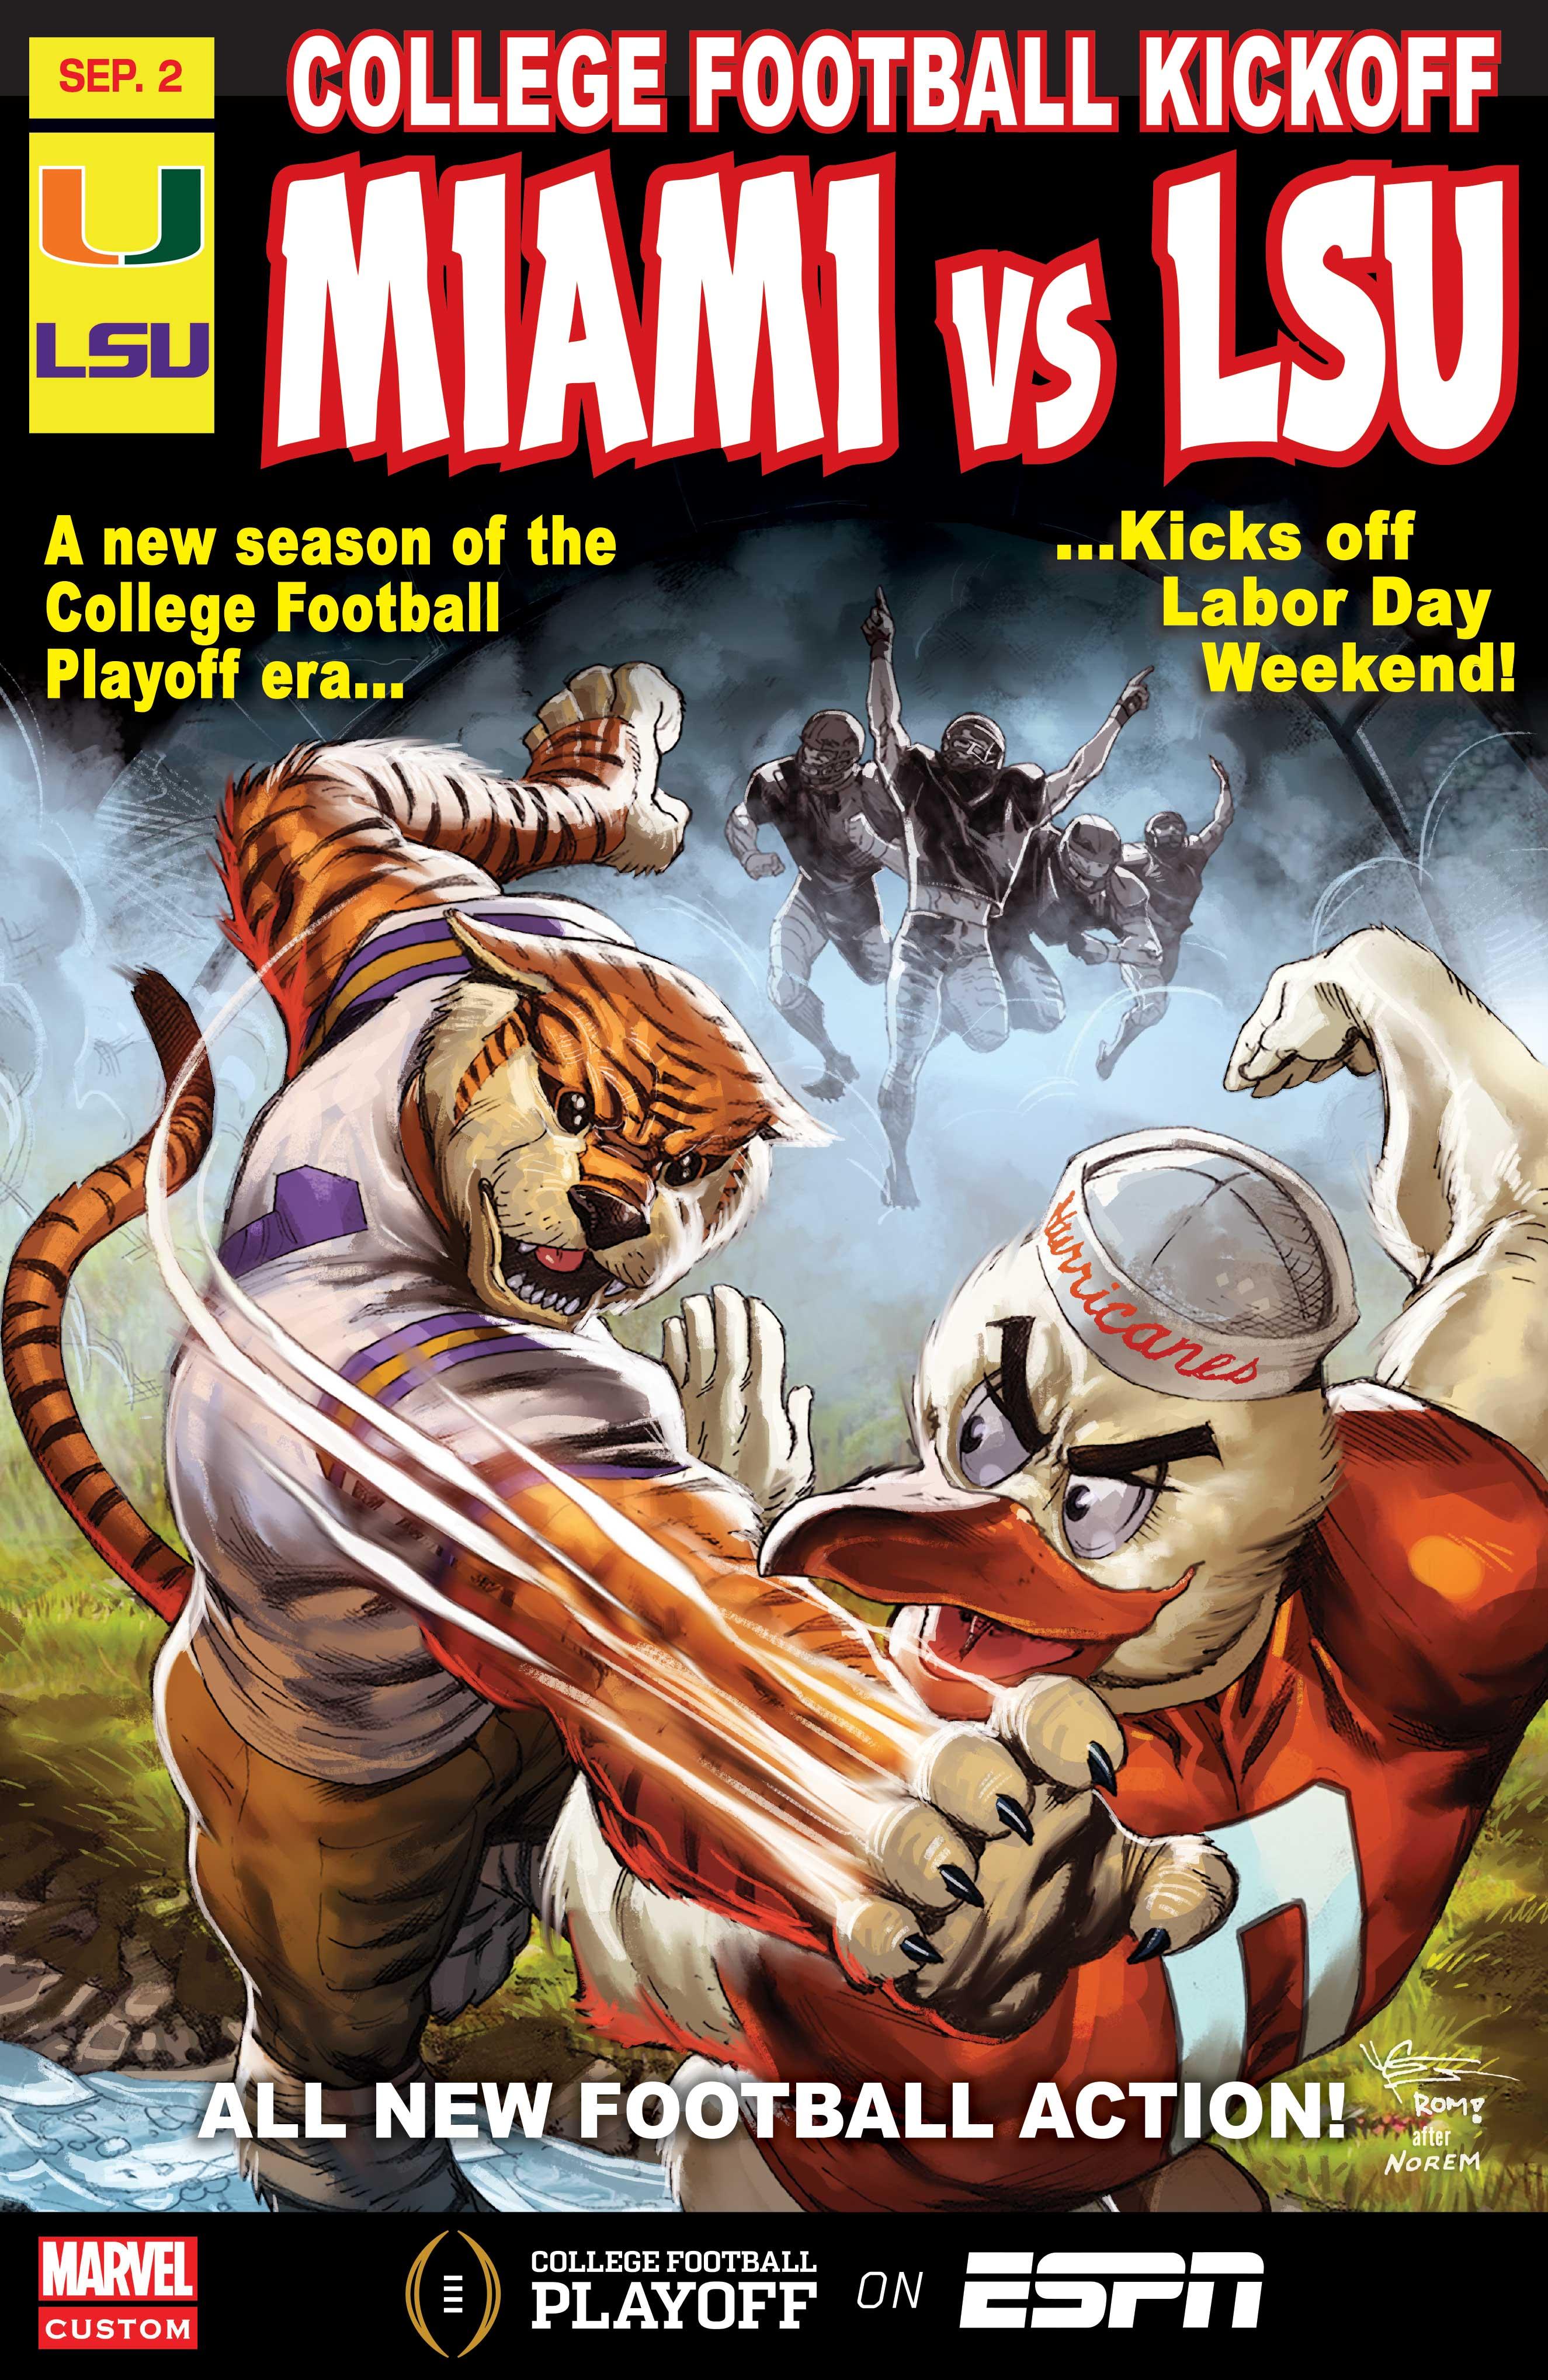 Marvel-ESPN-College Football-NCAA-futbol colegial-04